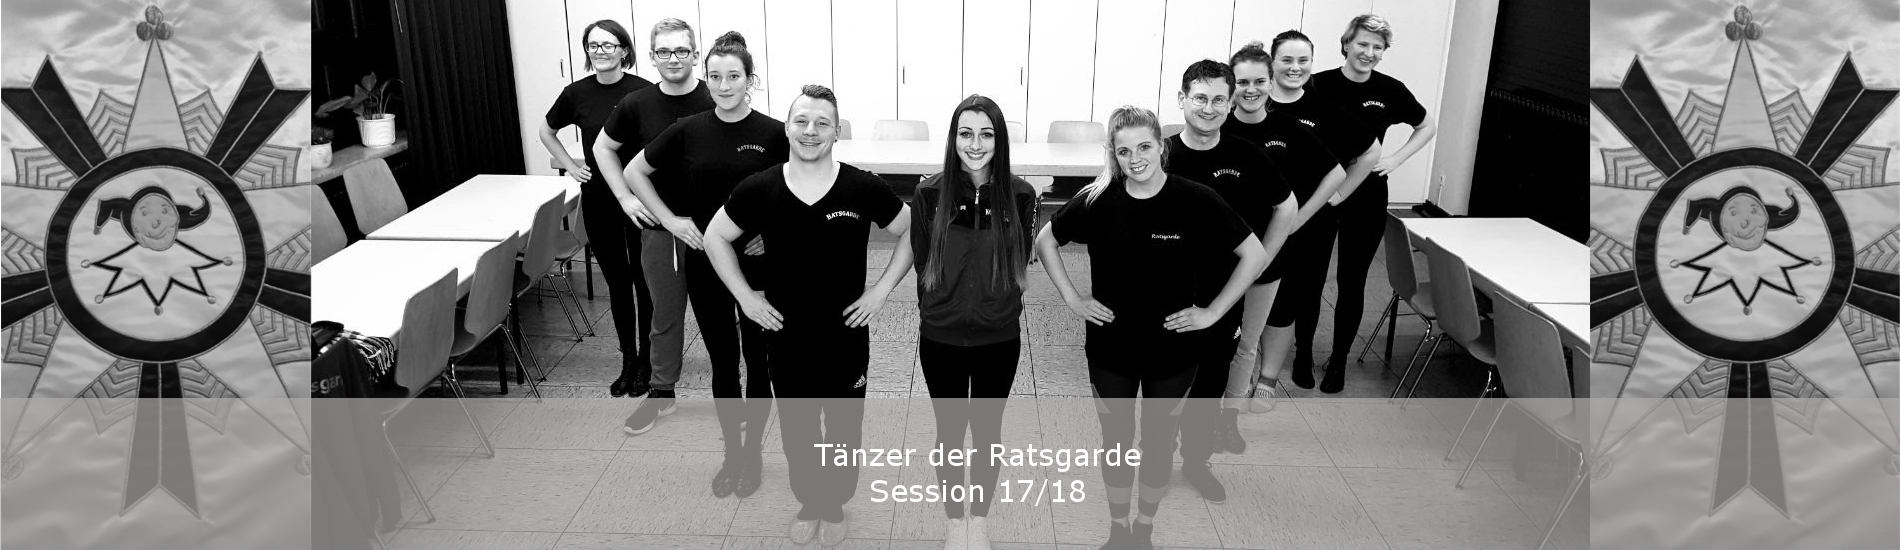 Teaser TanzendeRatsgarde